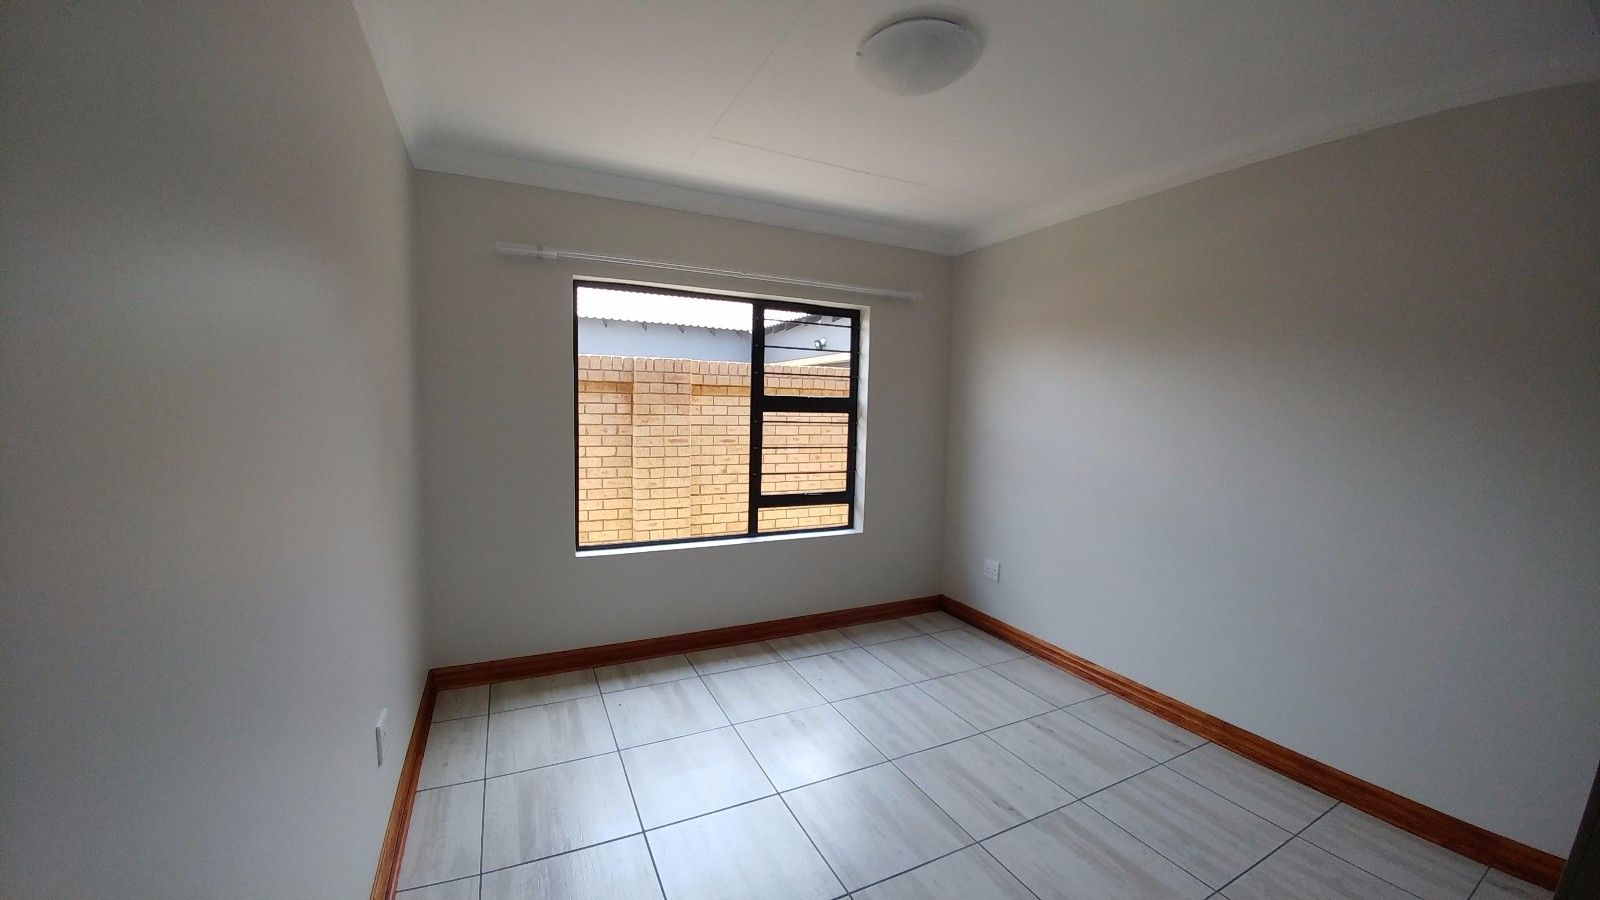 Baillie Park property for sale. Ref No: 13453104. Picture no 5